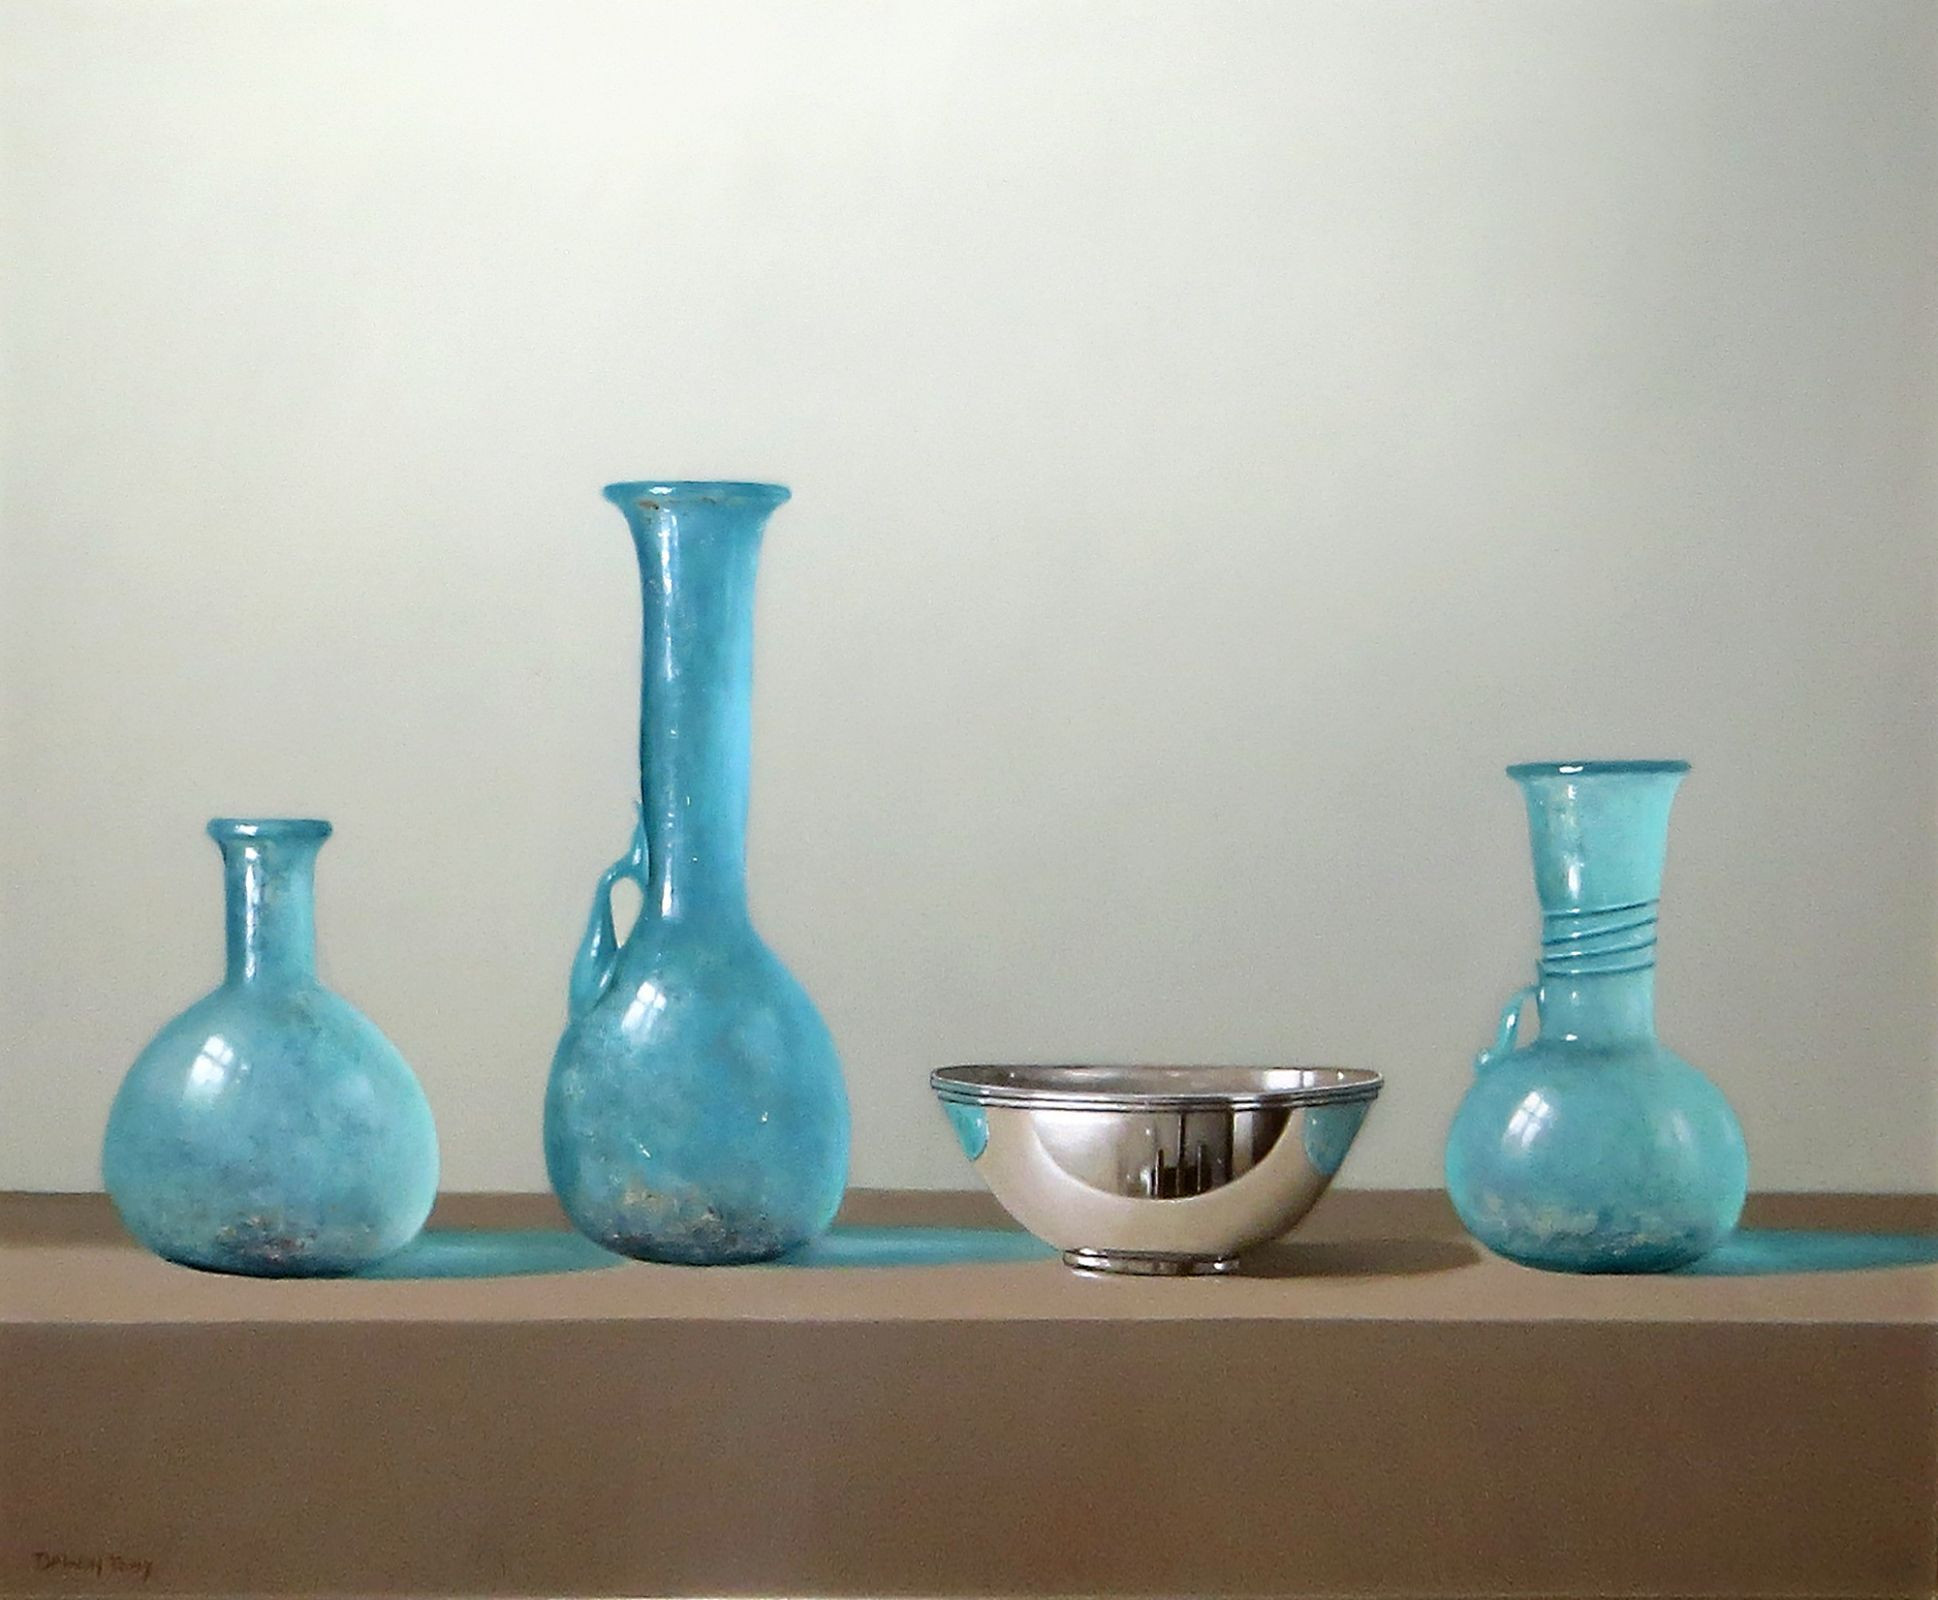 luxury vases for sale of fenton blue glass vase unique download wallpaper blue glass vases regarding fenton blue glass vase unique download wallpaper blue glass vases for sale